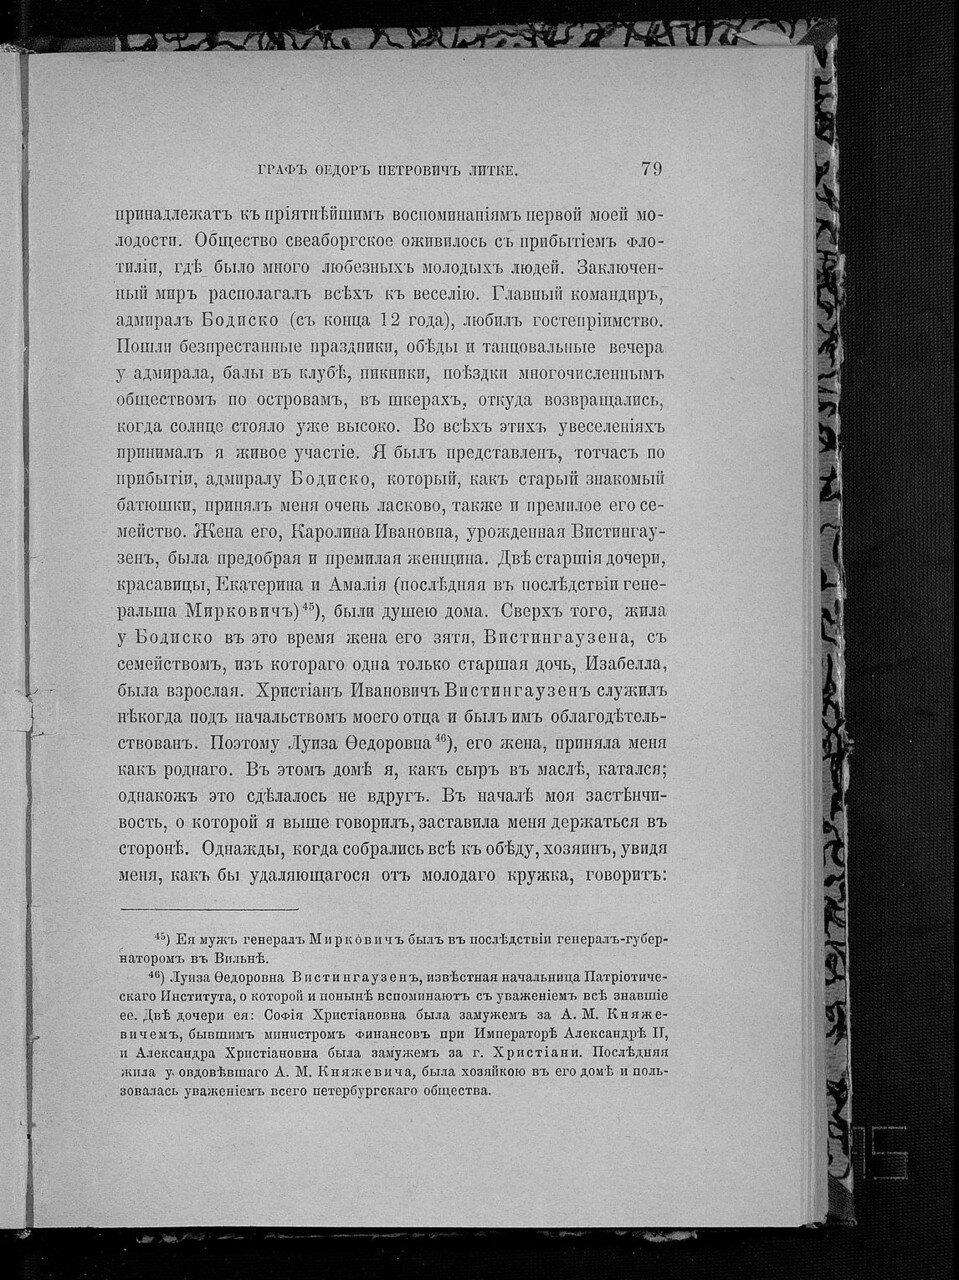 https://img-fotki.yandex.ru/get/874316/199368979.d4/0_21ddee_37c2a896_XXXL.jpg